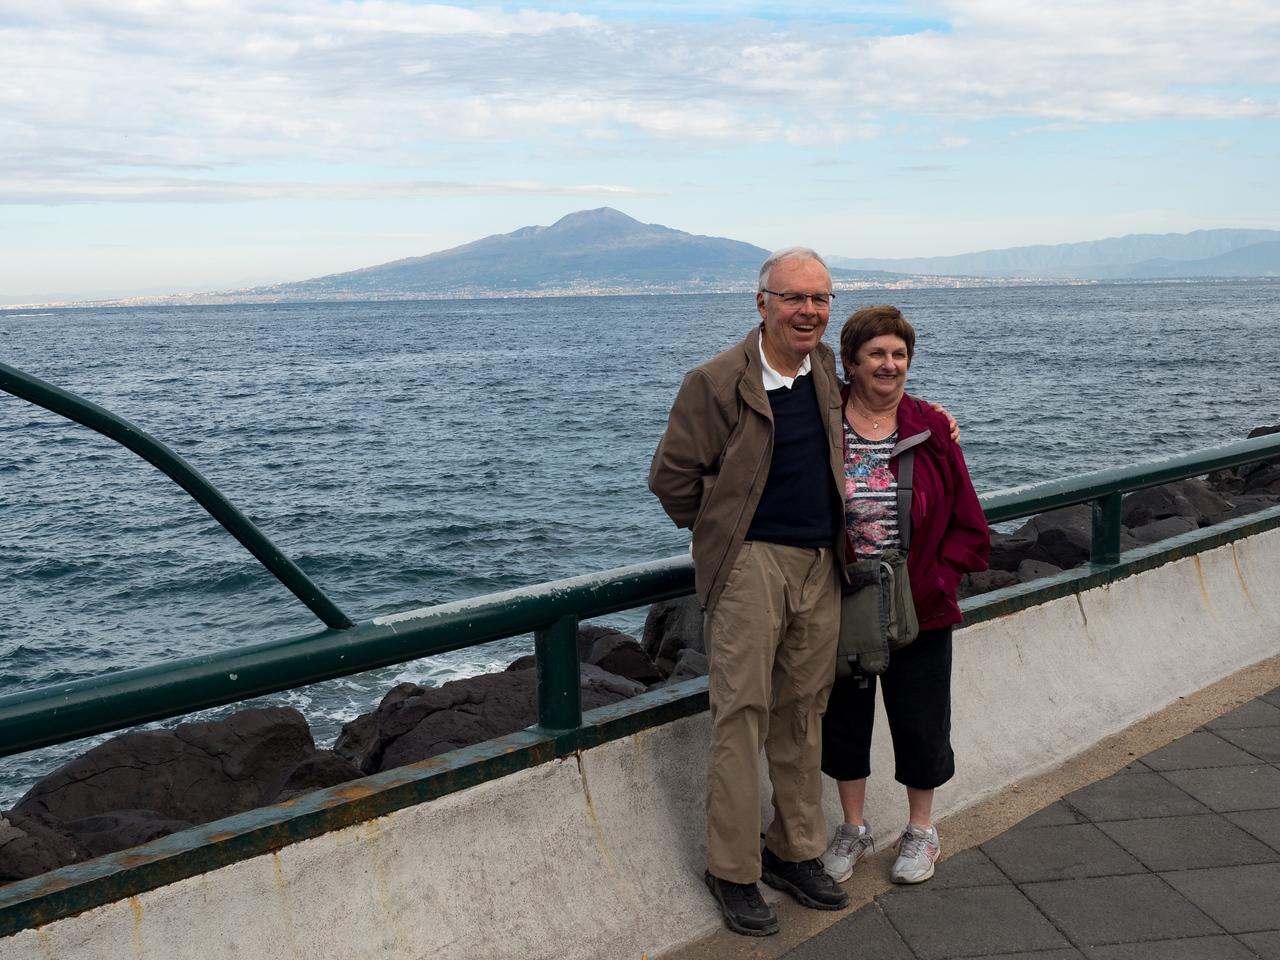 Alec and Kathy